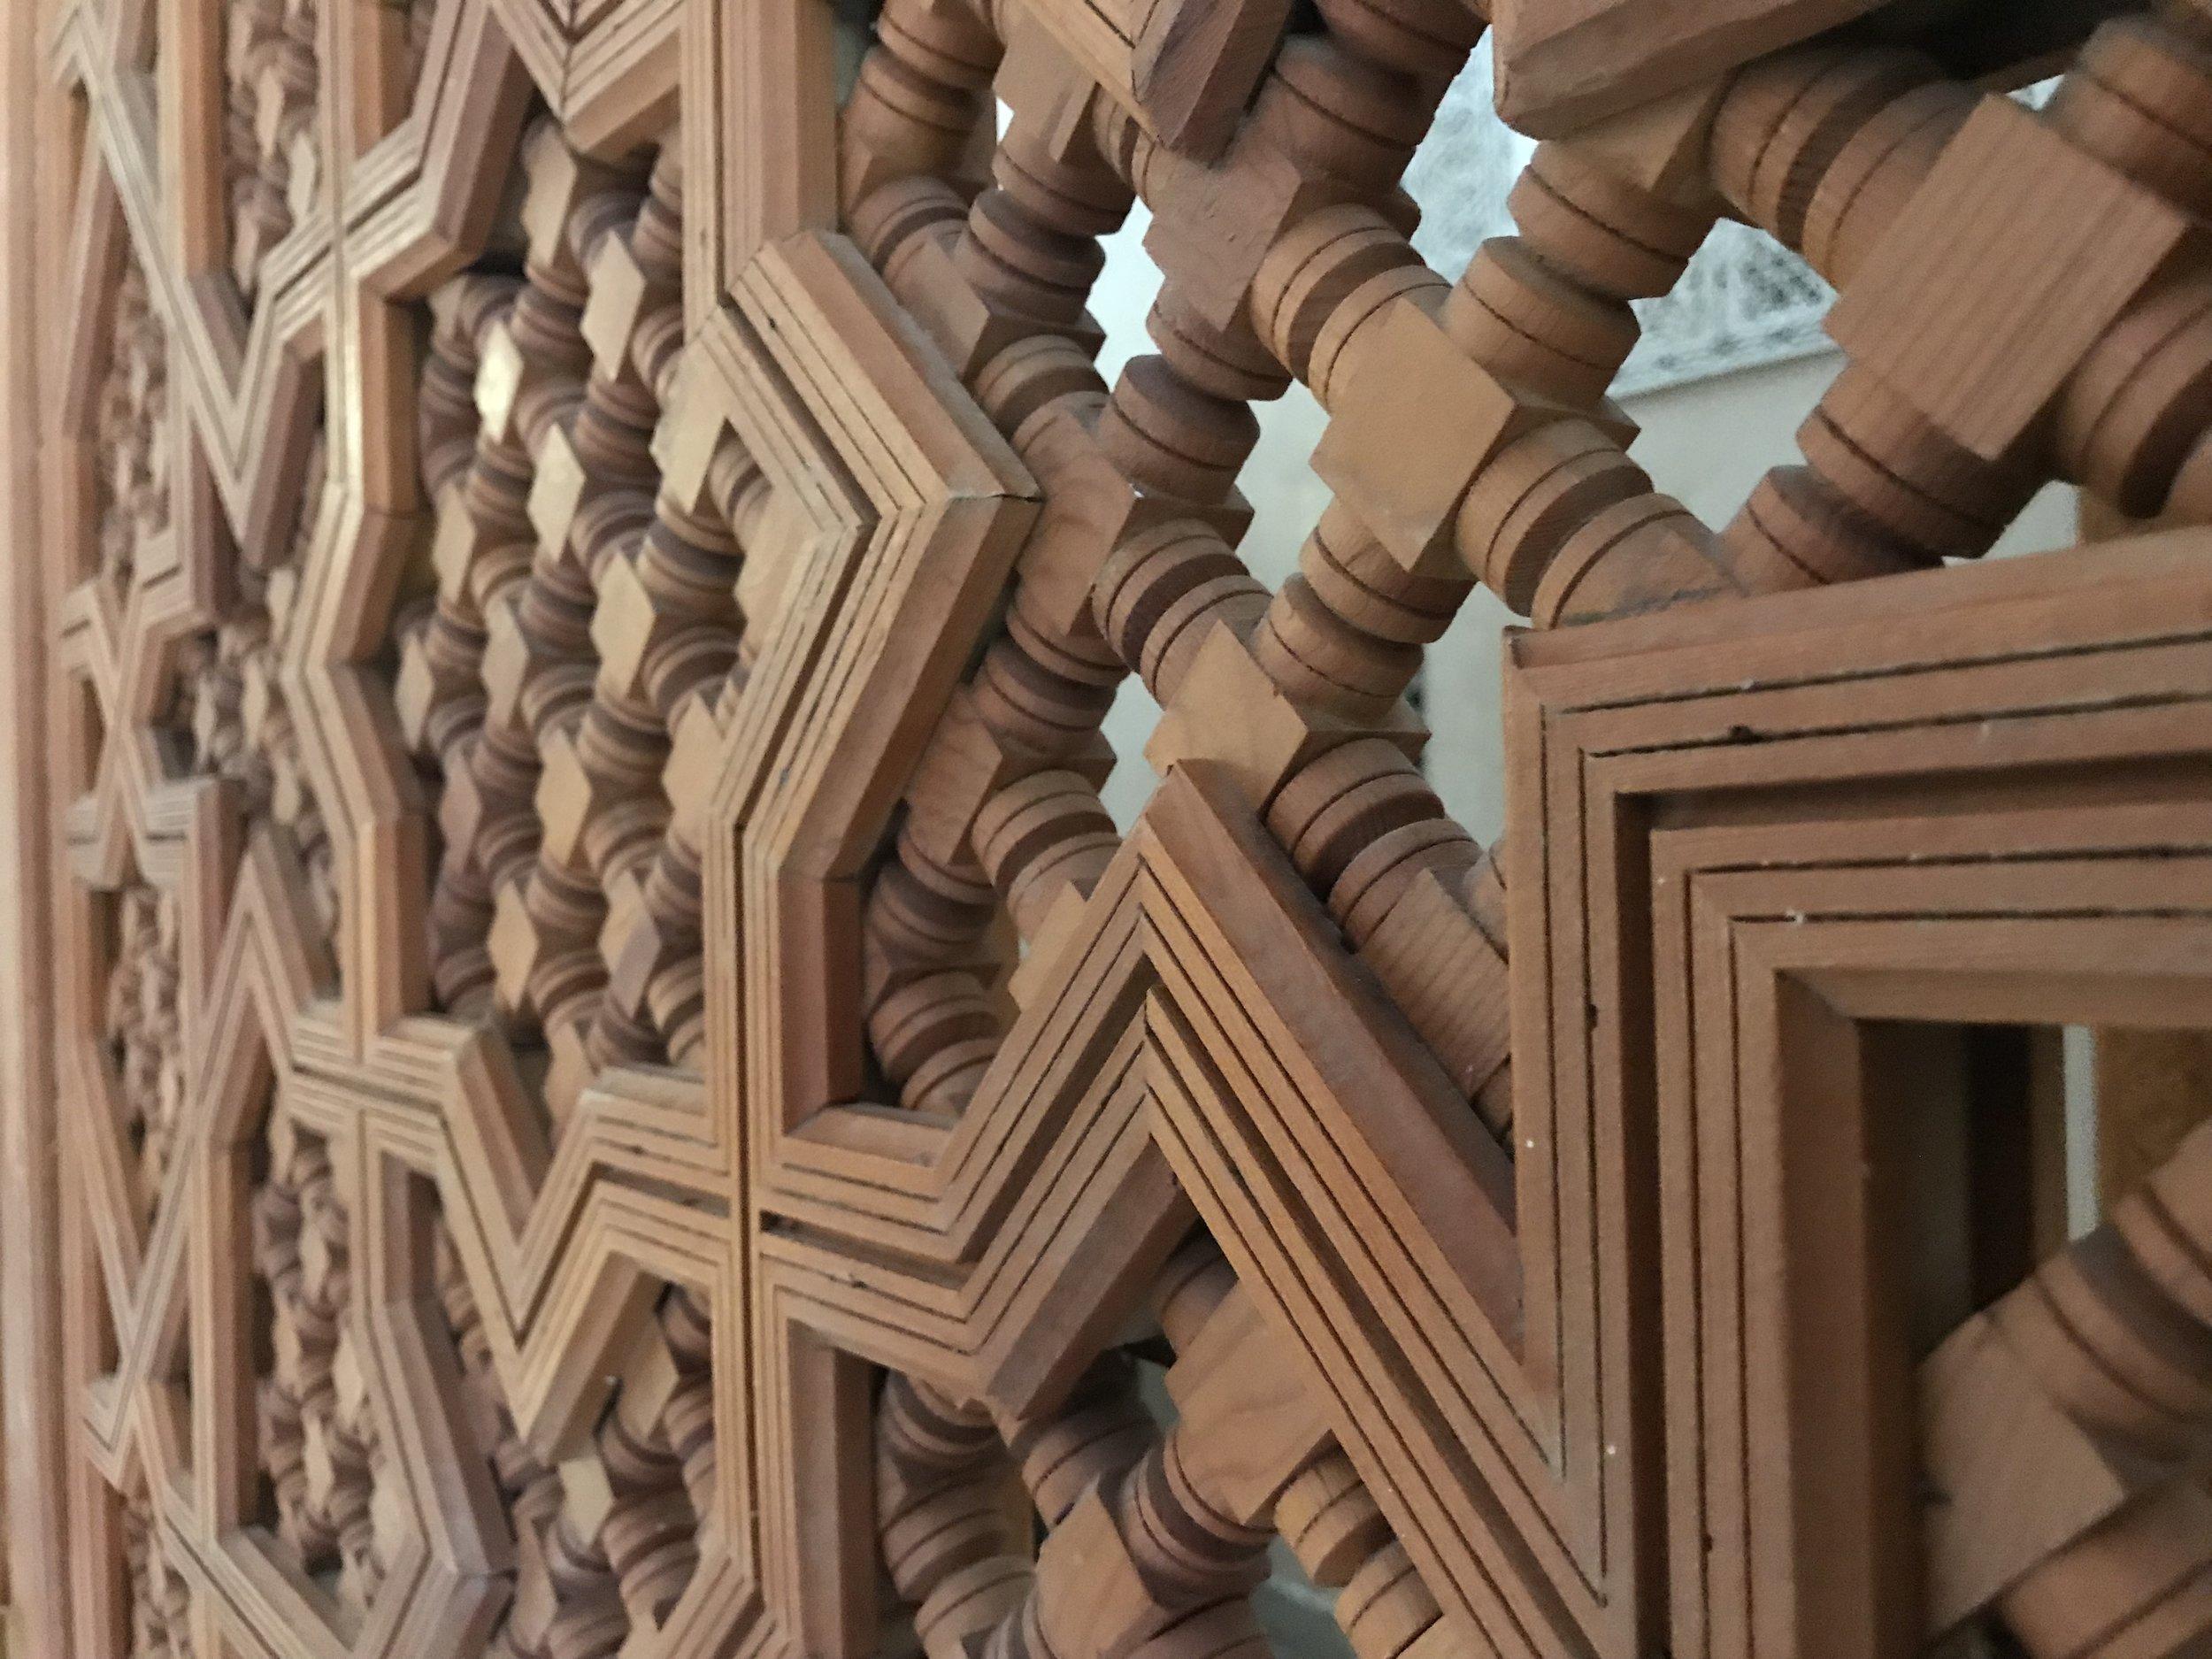 Mashrabiyya (wooden screen), Islamic Center of Science in Rabat, Morocco  Photo provided by Gwendalyn Ryan '20